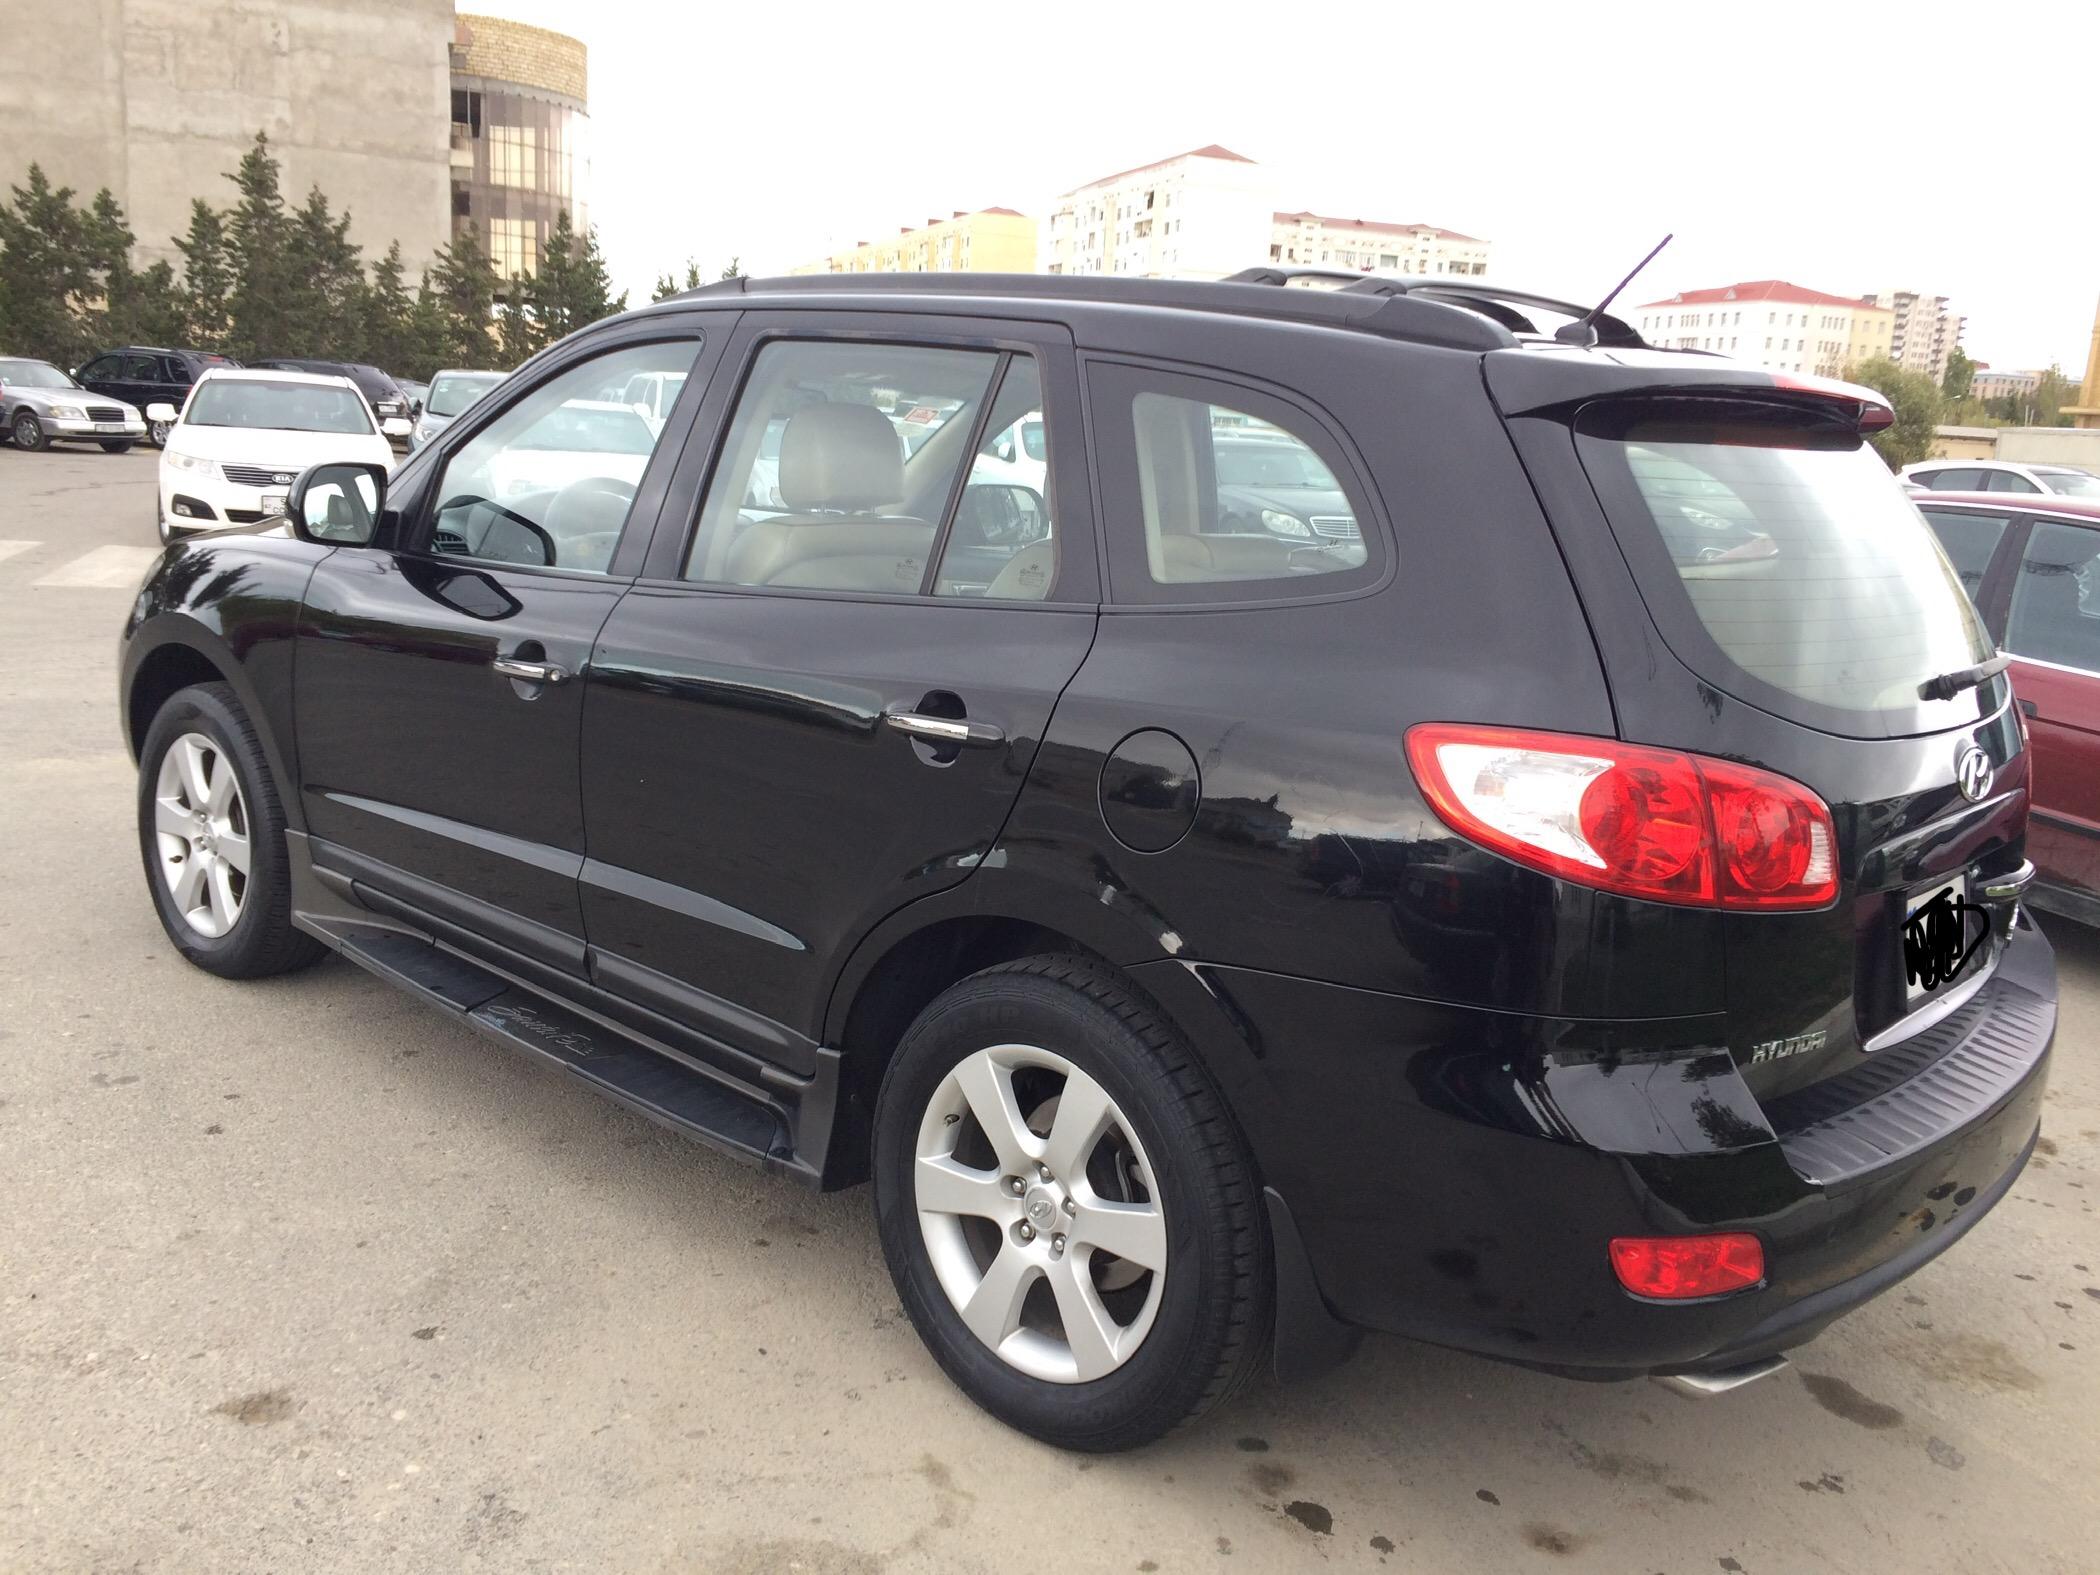 Hyundai Santa FE 2.7(lt) 2009 İkinci əl  $13300